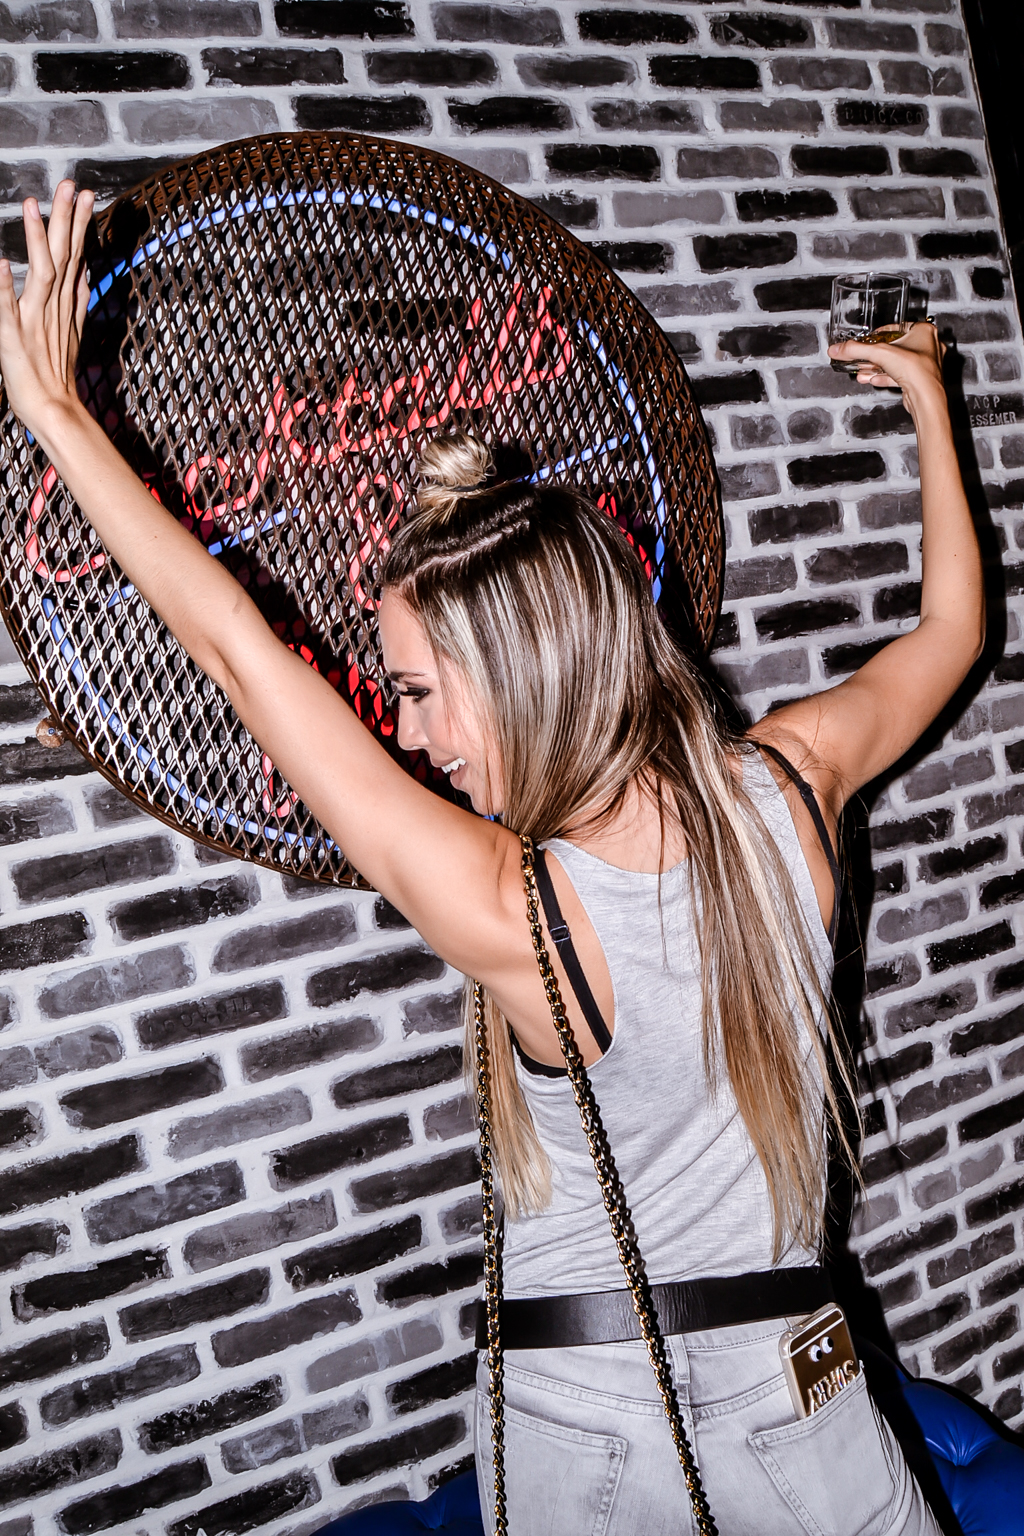 miami-events-illy-perez-fashion-photography-54.jpg